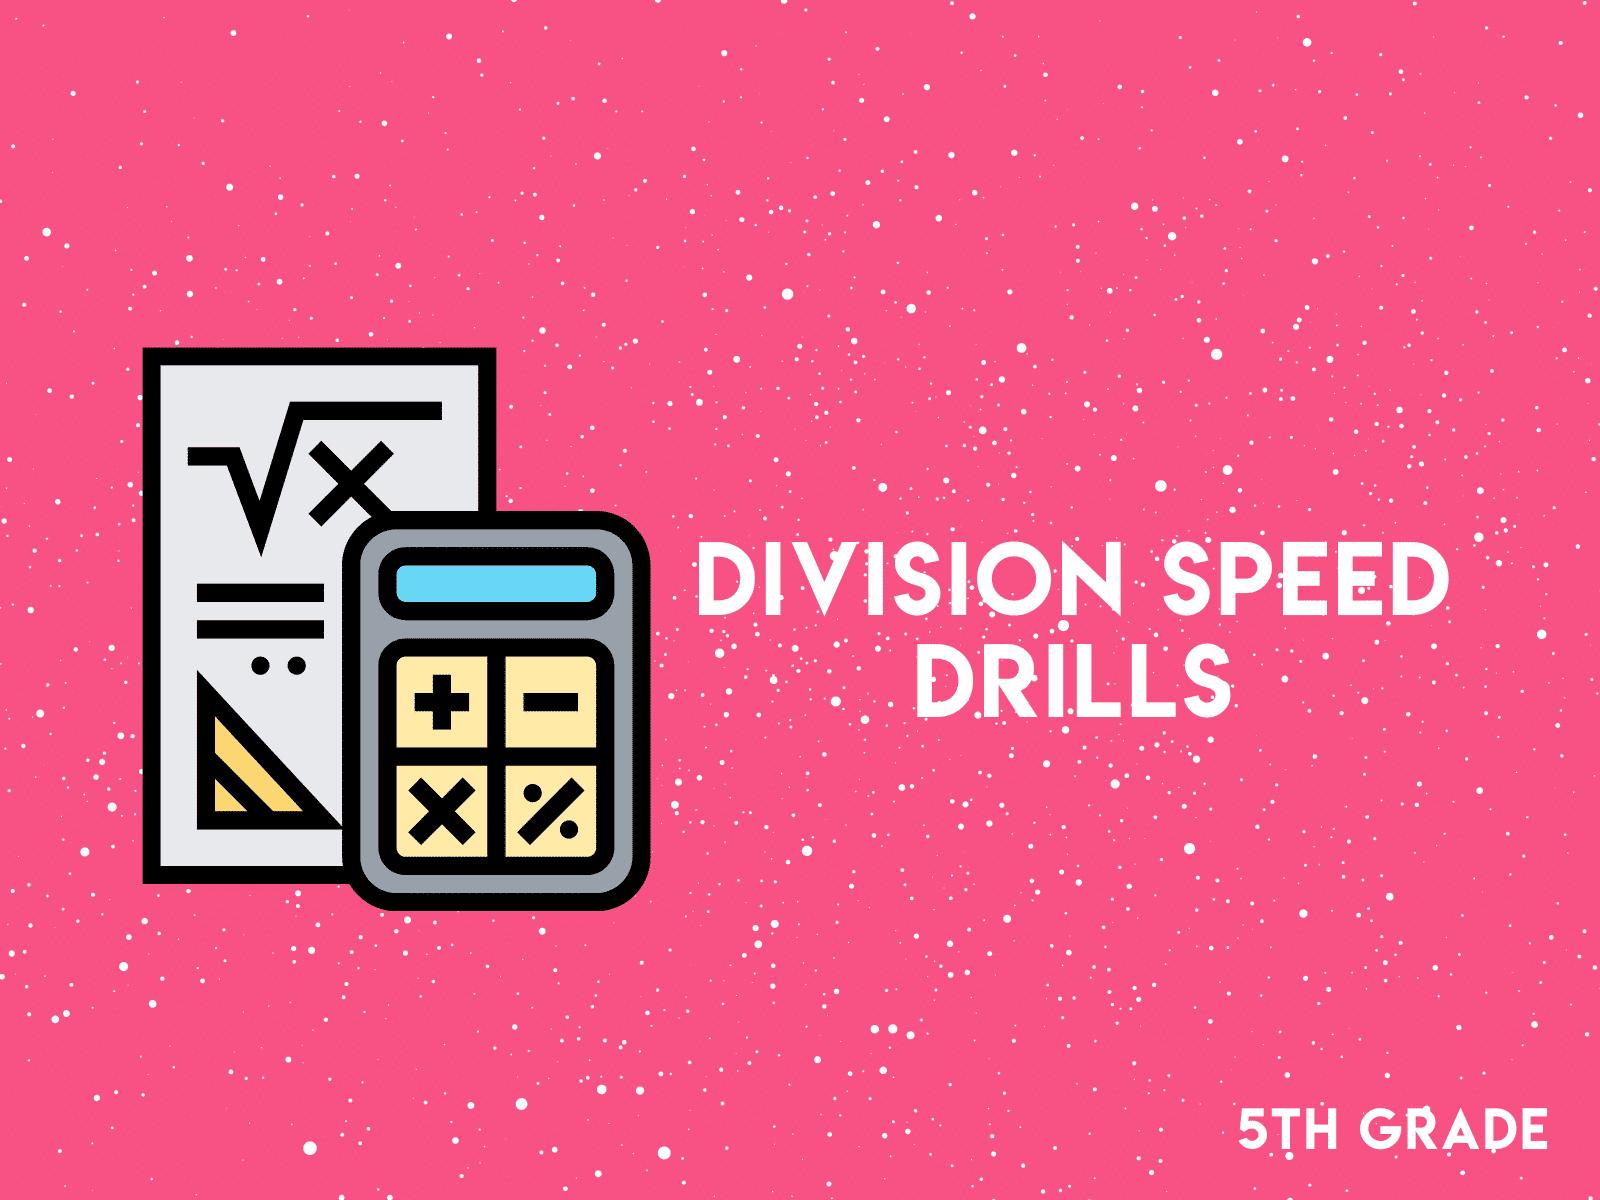 Division speed drills   5th grade math worksheets